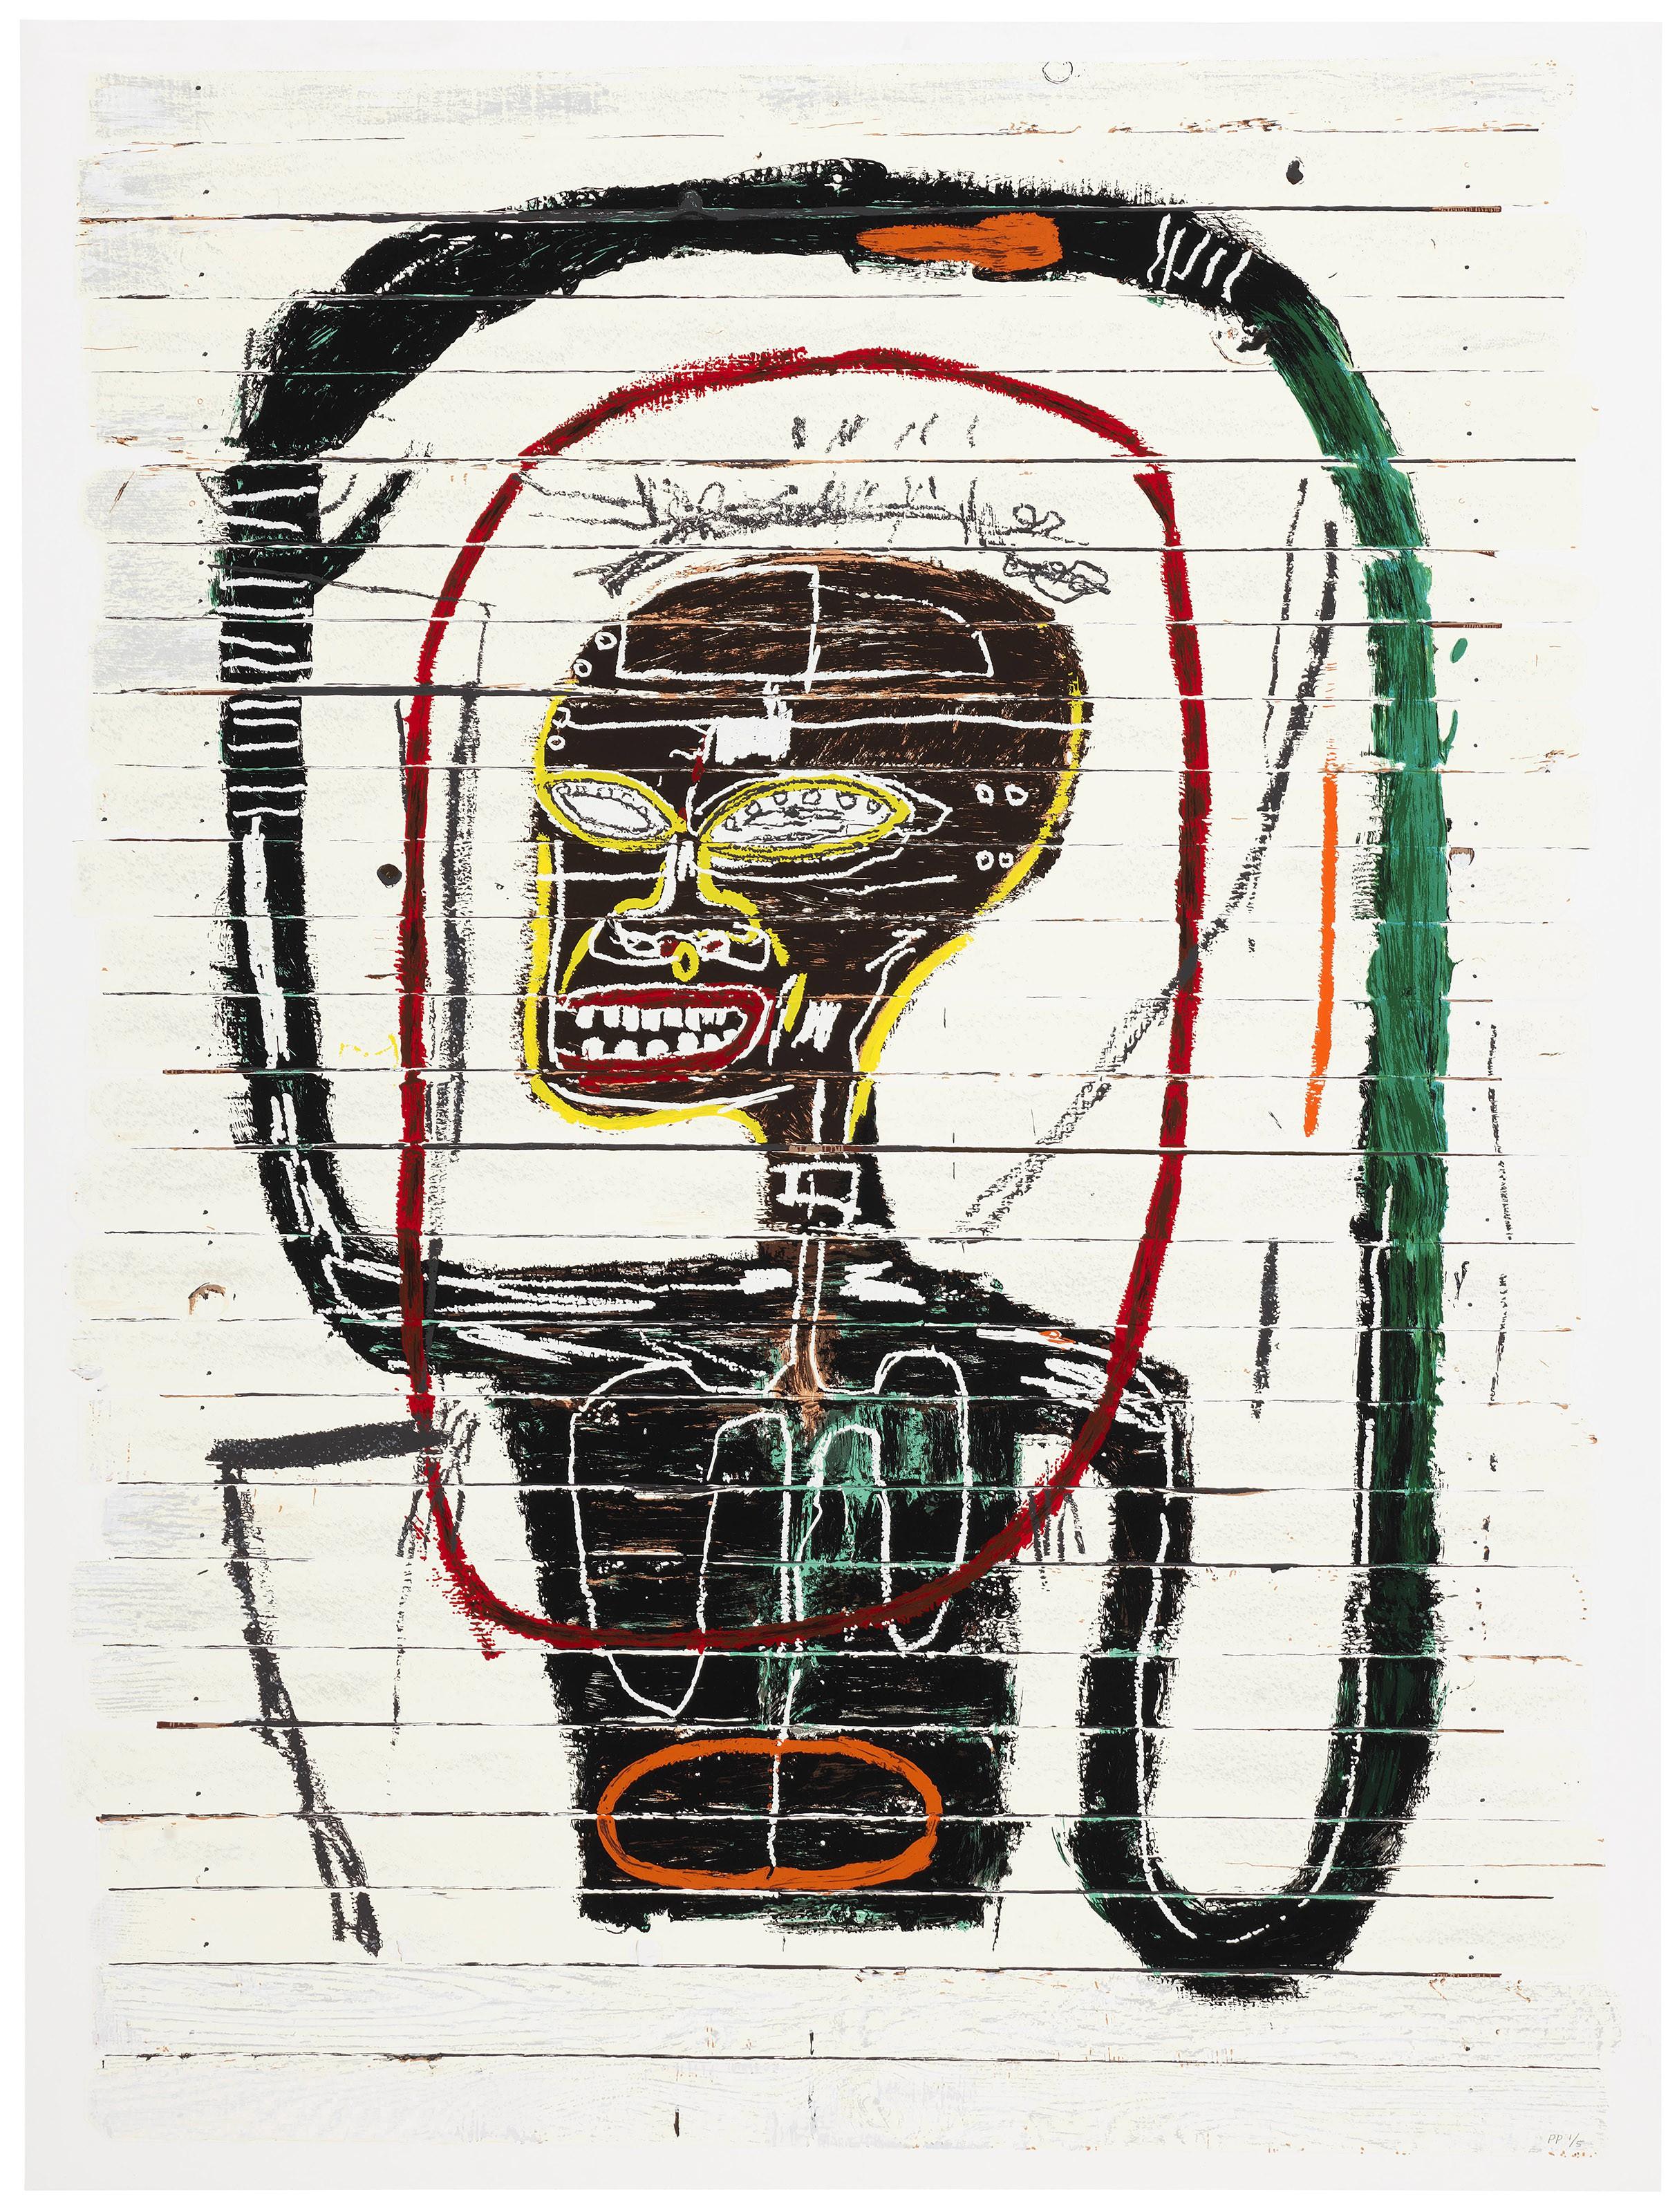 AFTER JEAN-MICHEL BASQUIAT (1960-1988)